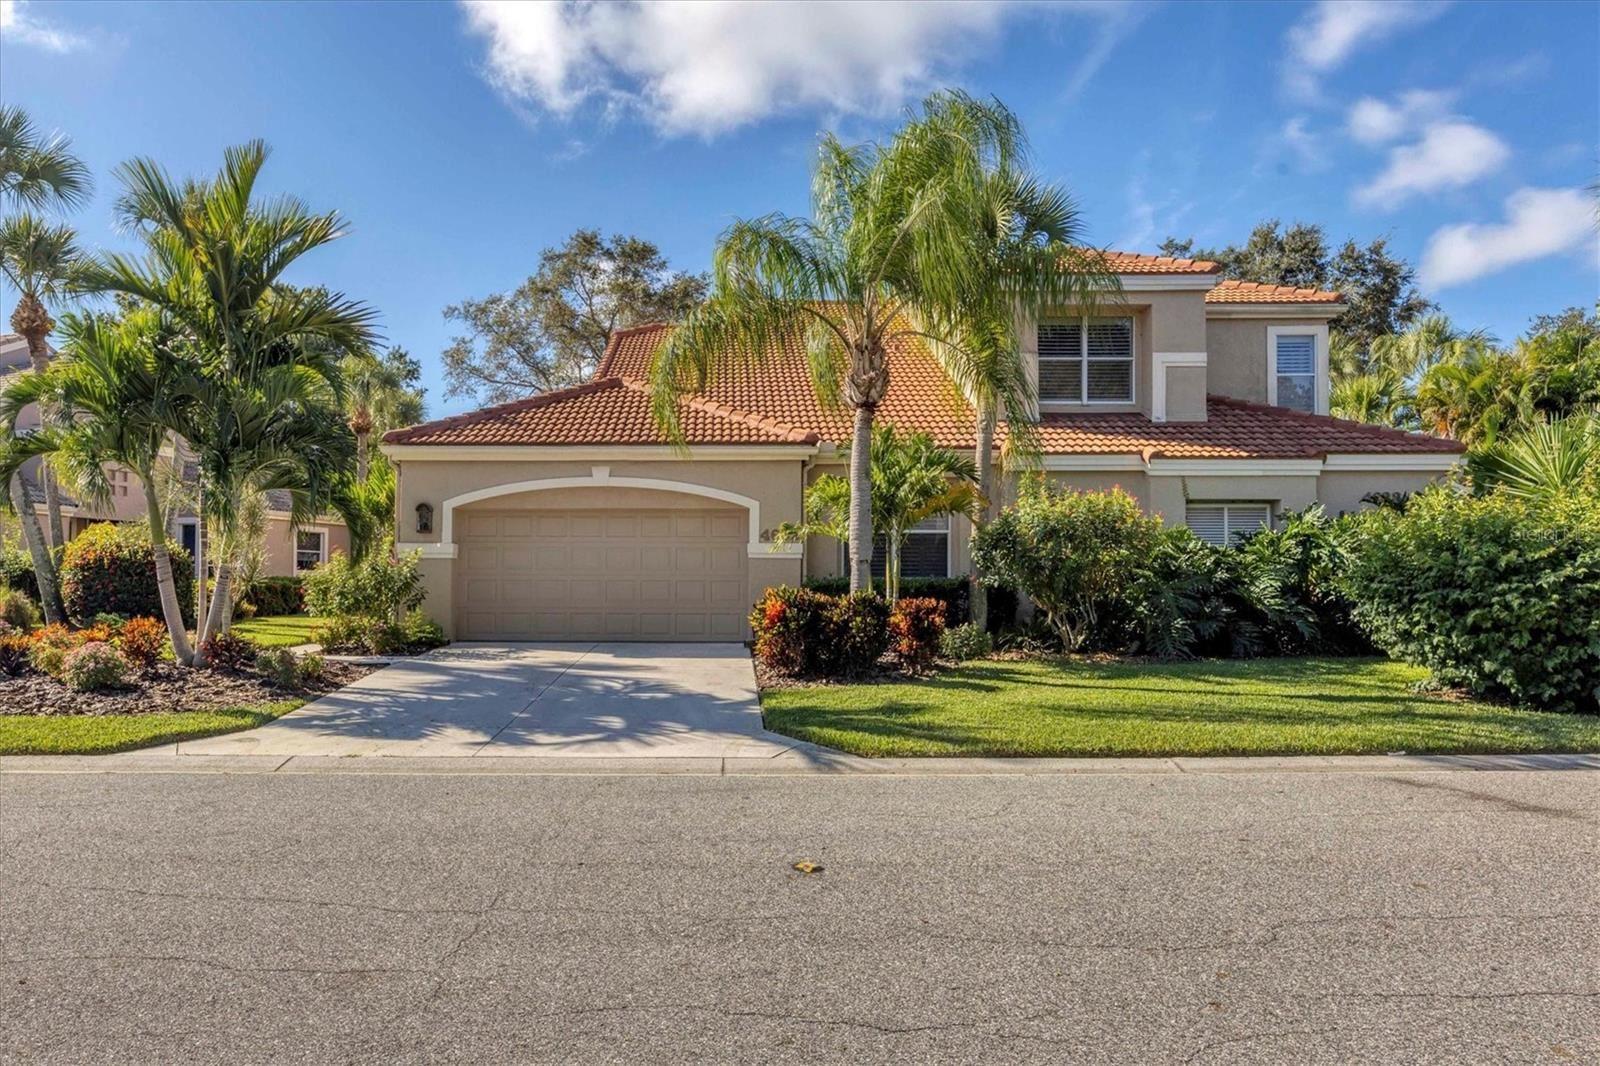 4632 DEER TRAIL BOULEVARD, Sarasota, FL 34238 - #: A4515200